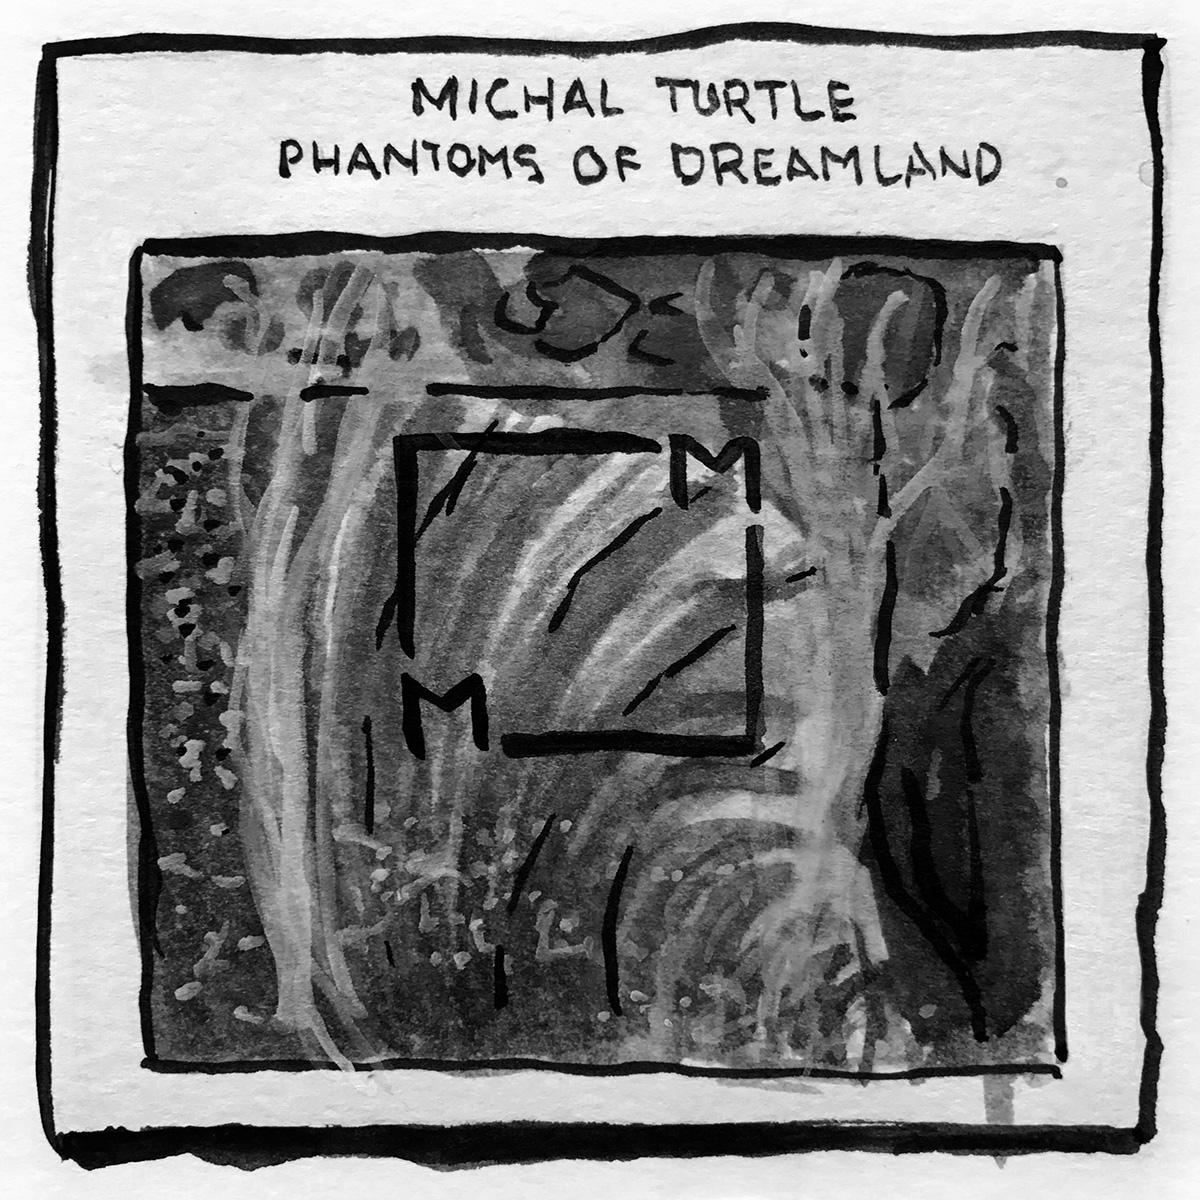 Michal Turtle Phantoms of Dreamland